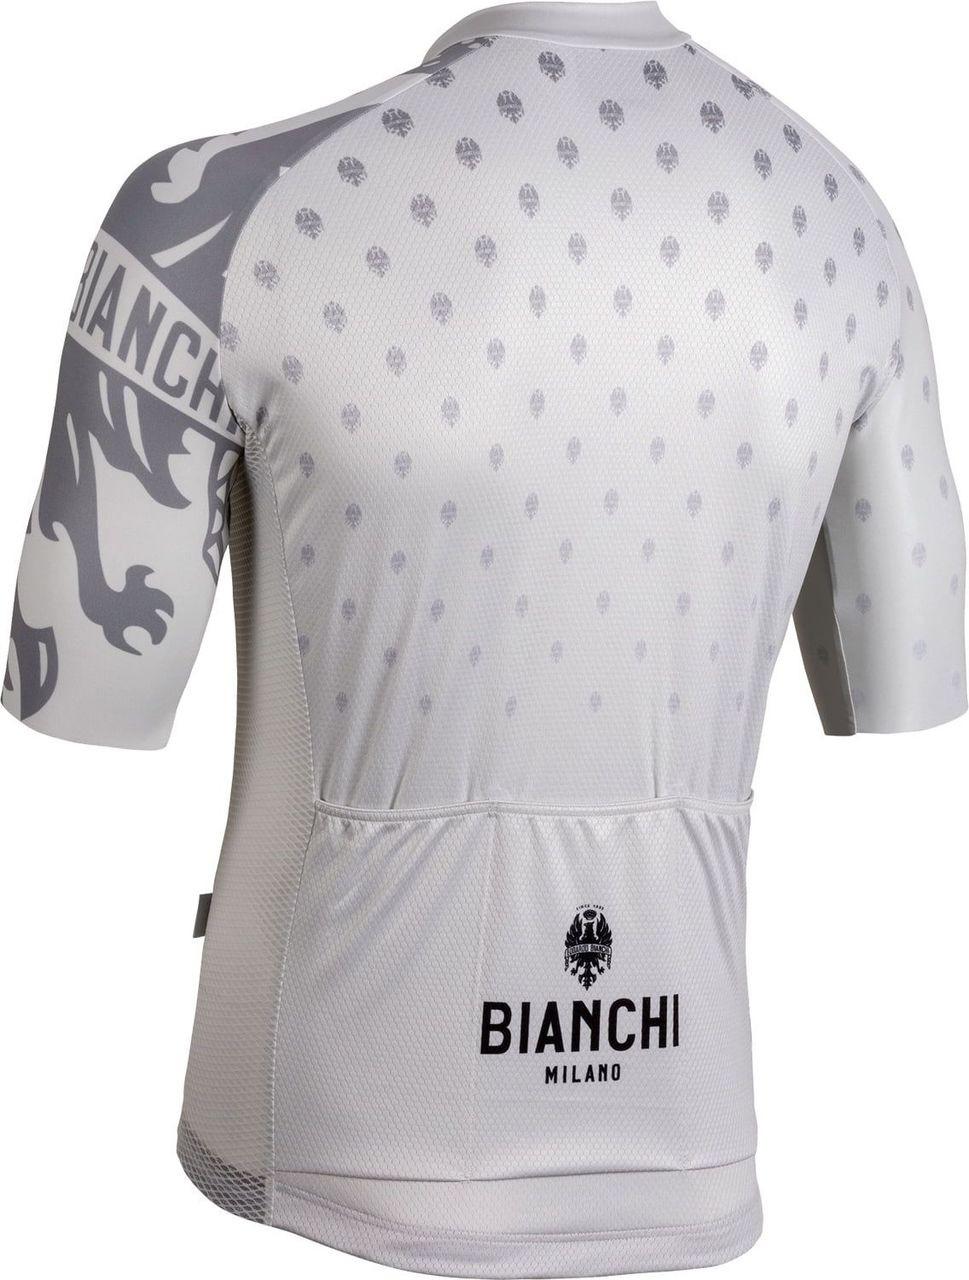 Bianchi Milano Savignano White Jersey Rear